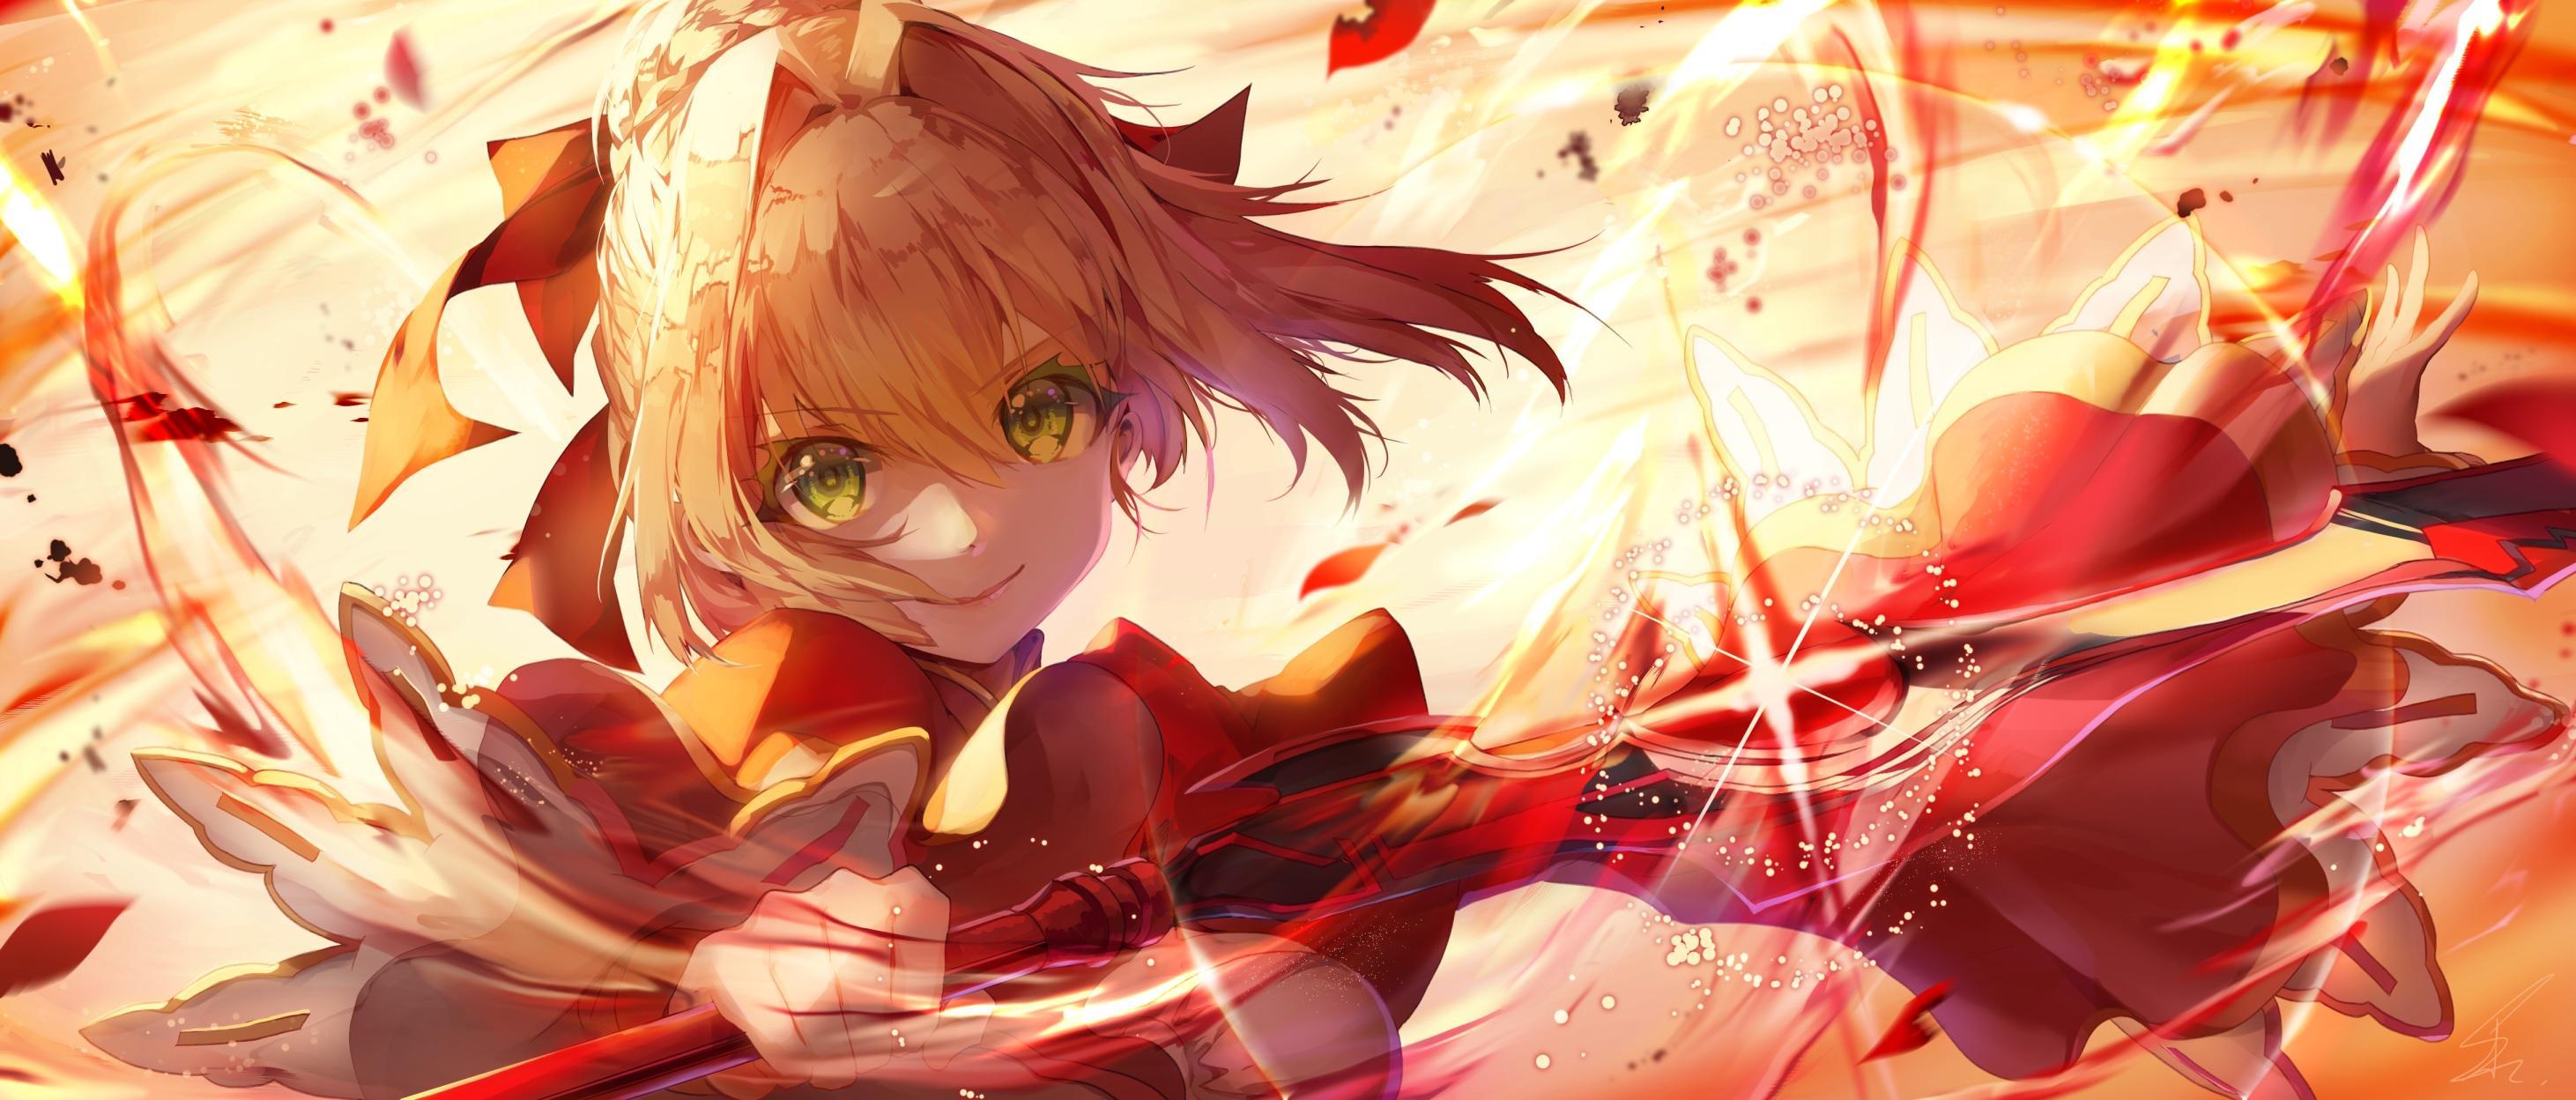 http://ipic.su/img/img7/fs/Saber-Extra-FateExtra-Fate-(series)-Anime-4188747.1520382241.jpg